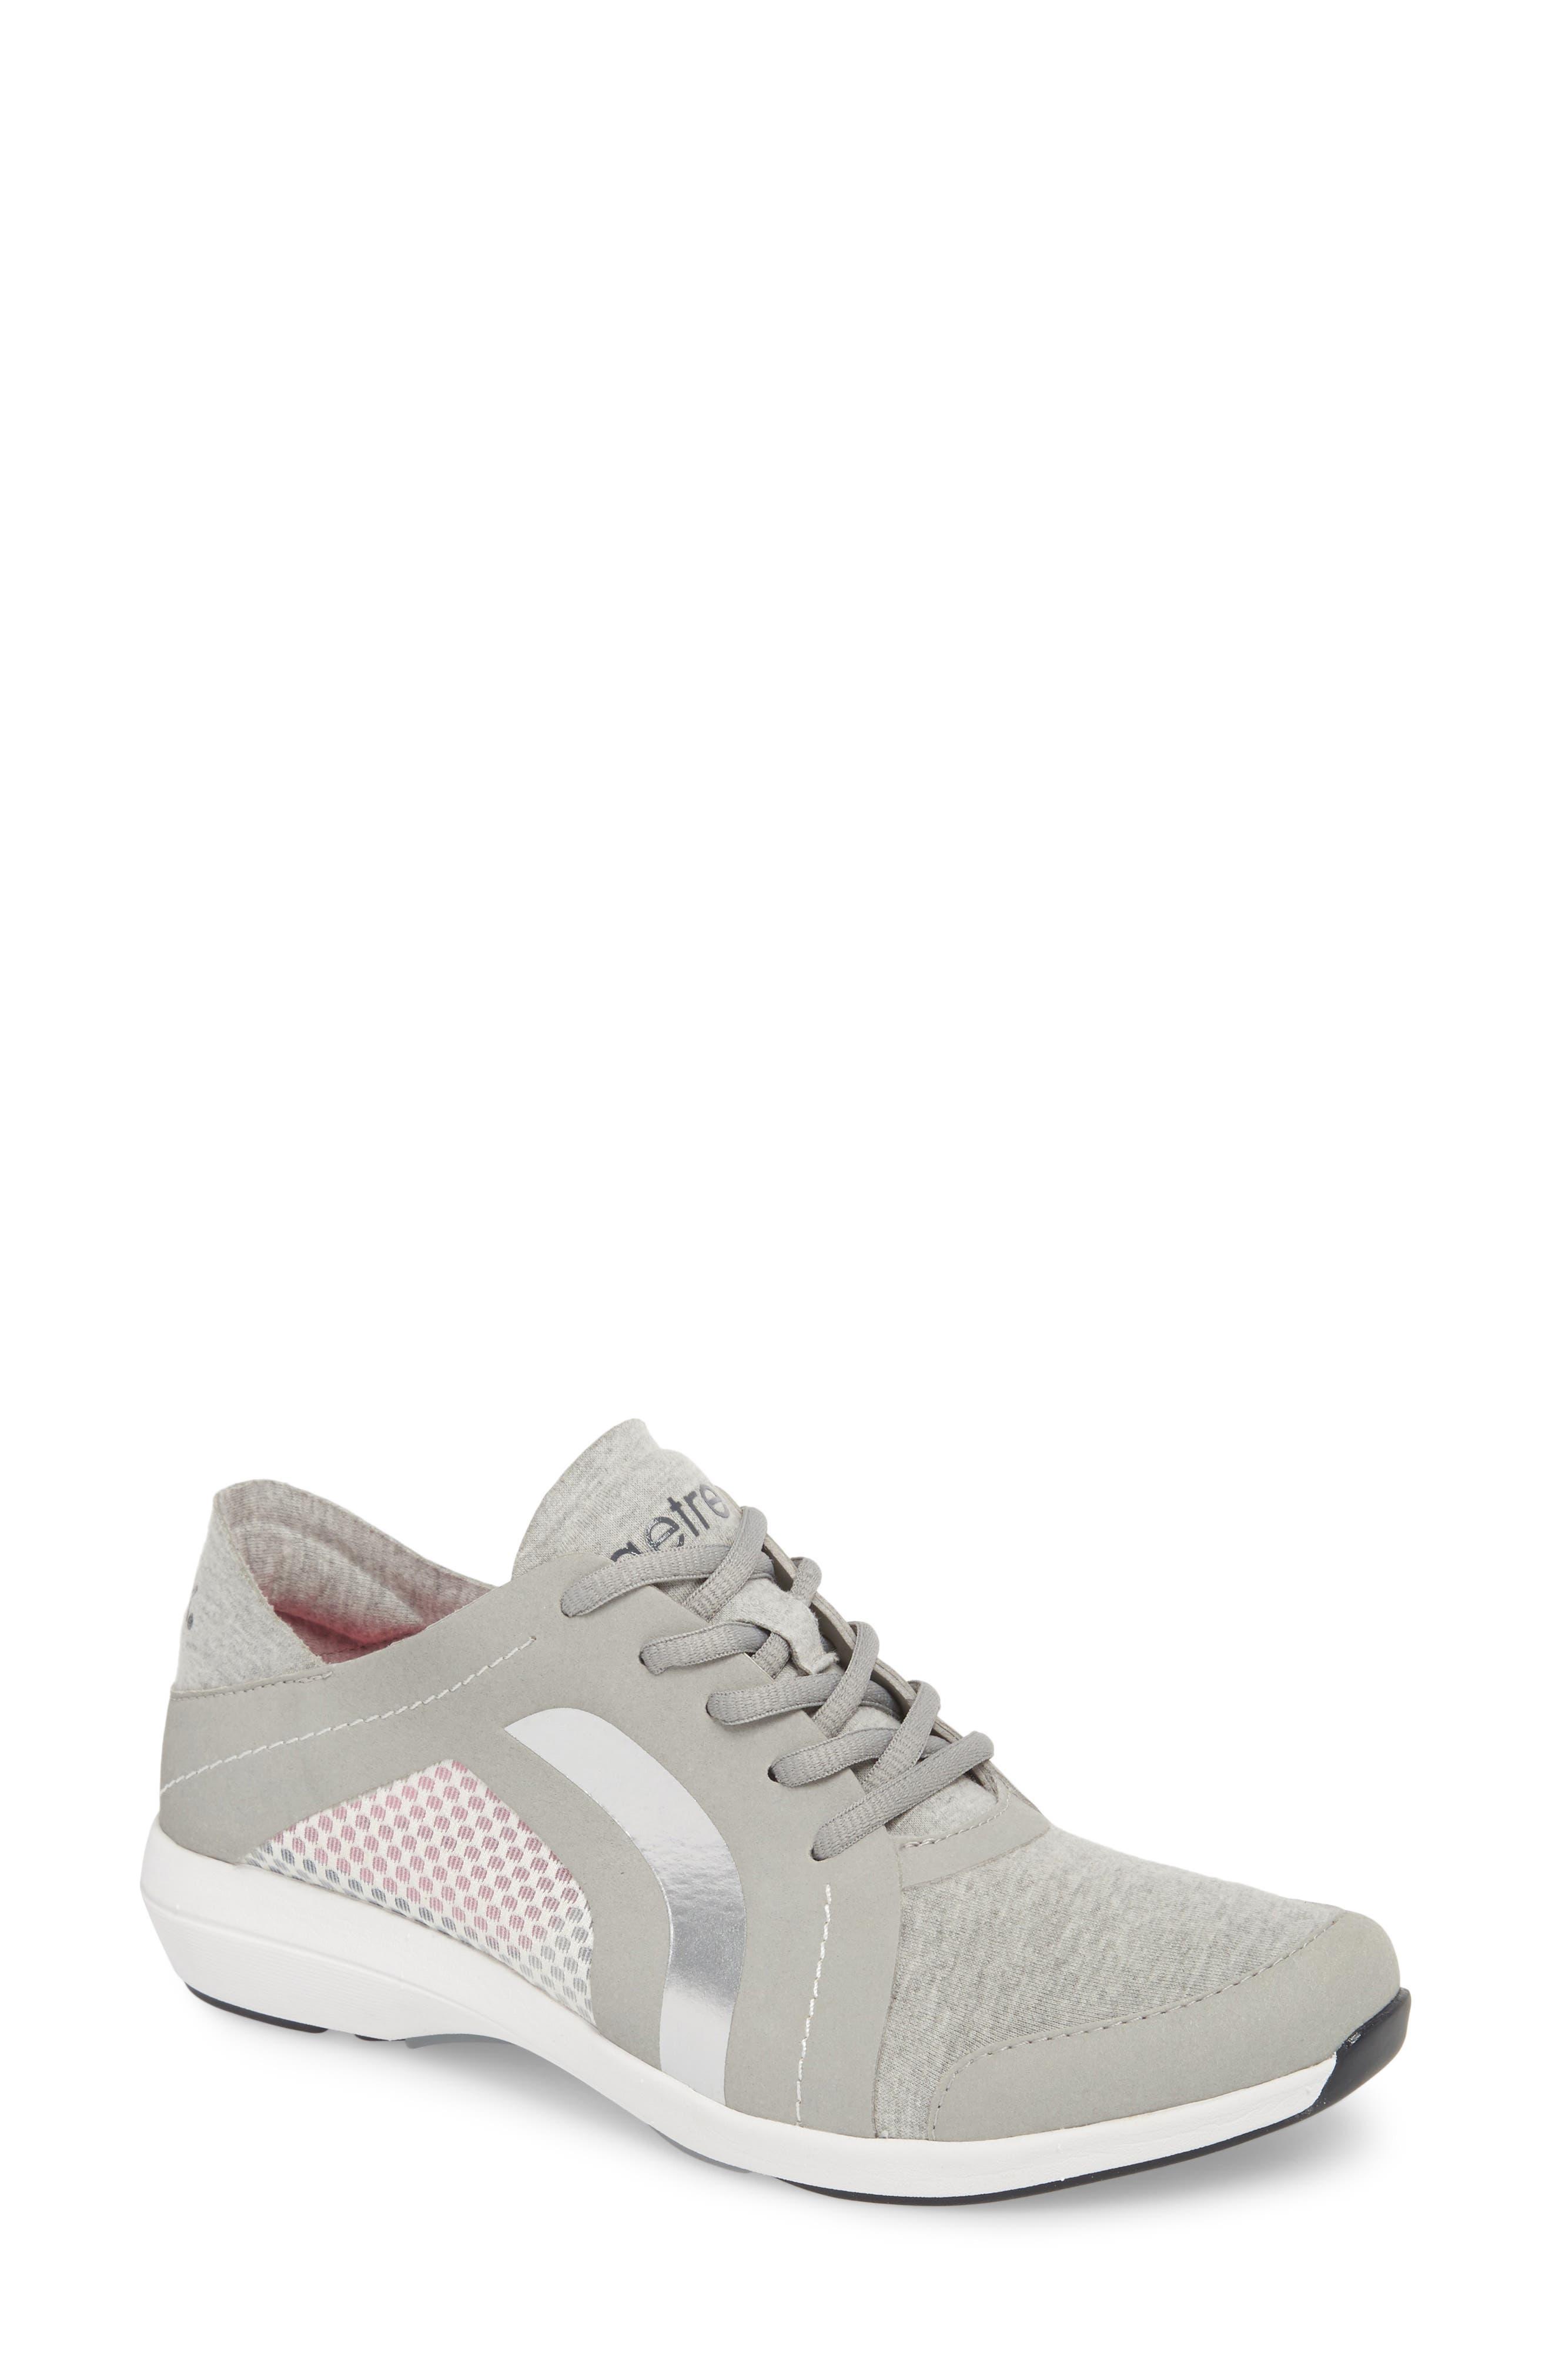 Sloane Sneaker,                         Main,                         color, Grey Fabric